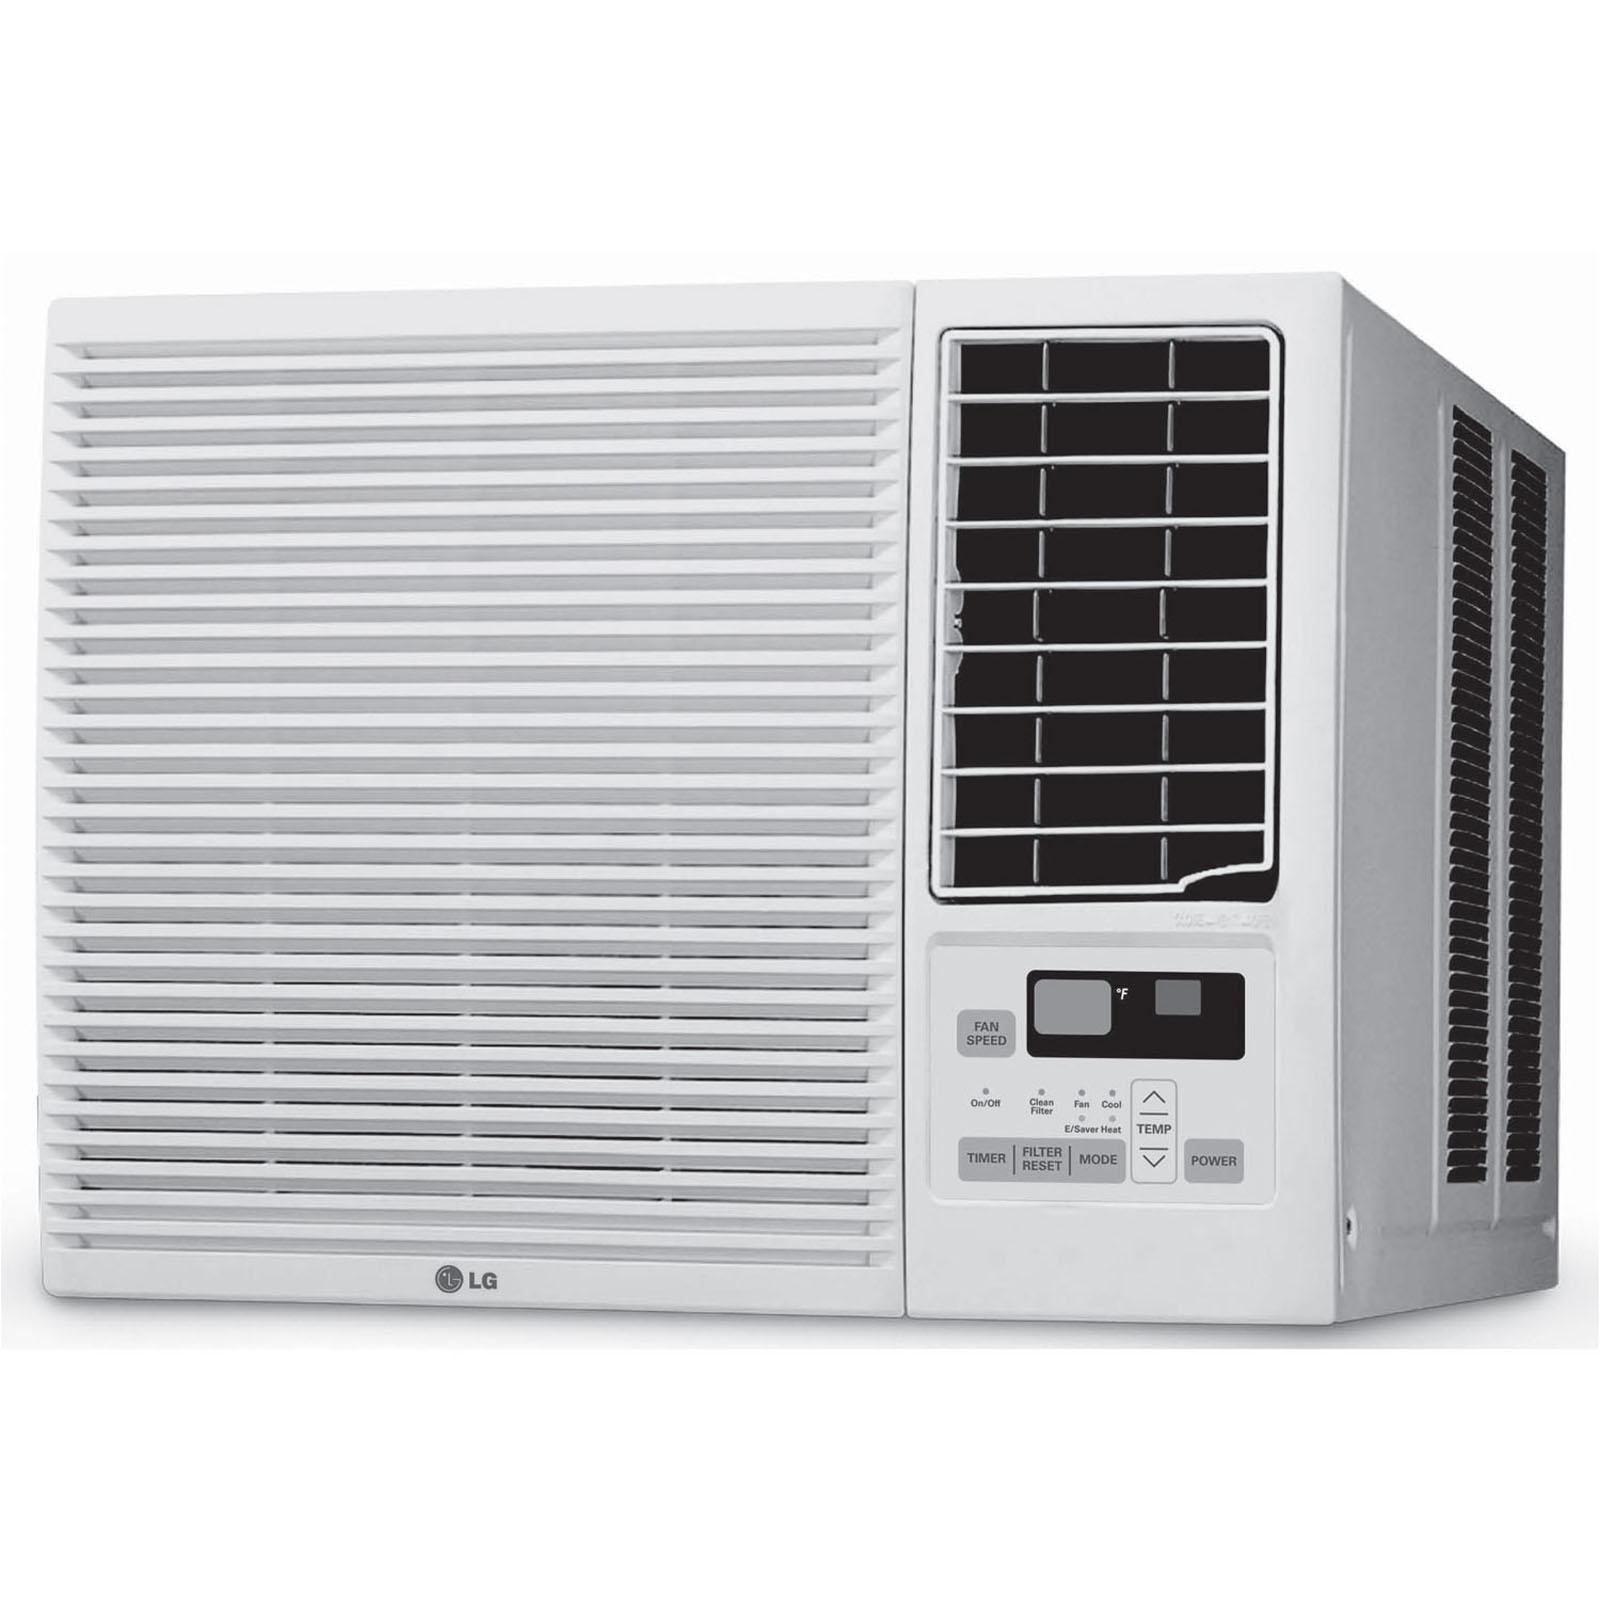 lg lw7014hr 7 000 btu 115v window mounted room air conditioner with 3 850 btu supplemental. Black Bedroom Furniture Sets. Home Design Ideas